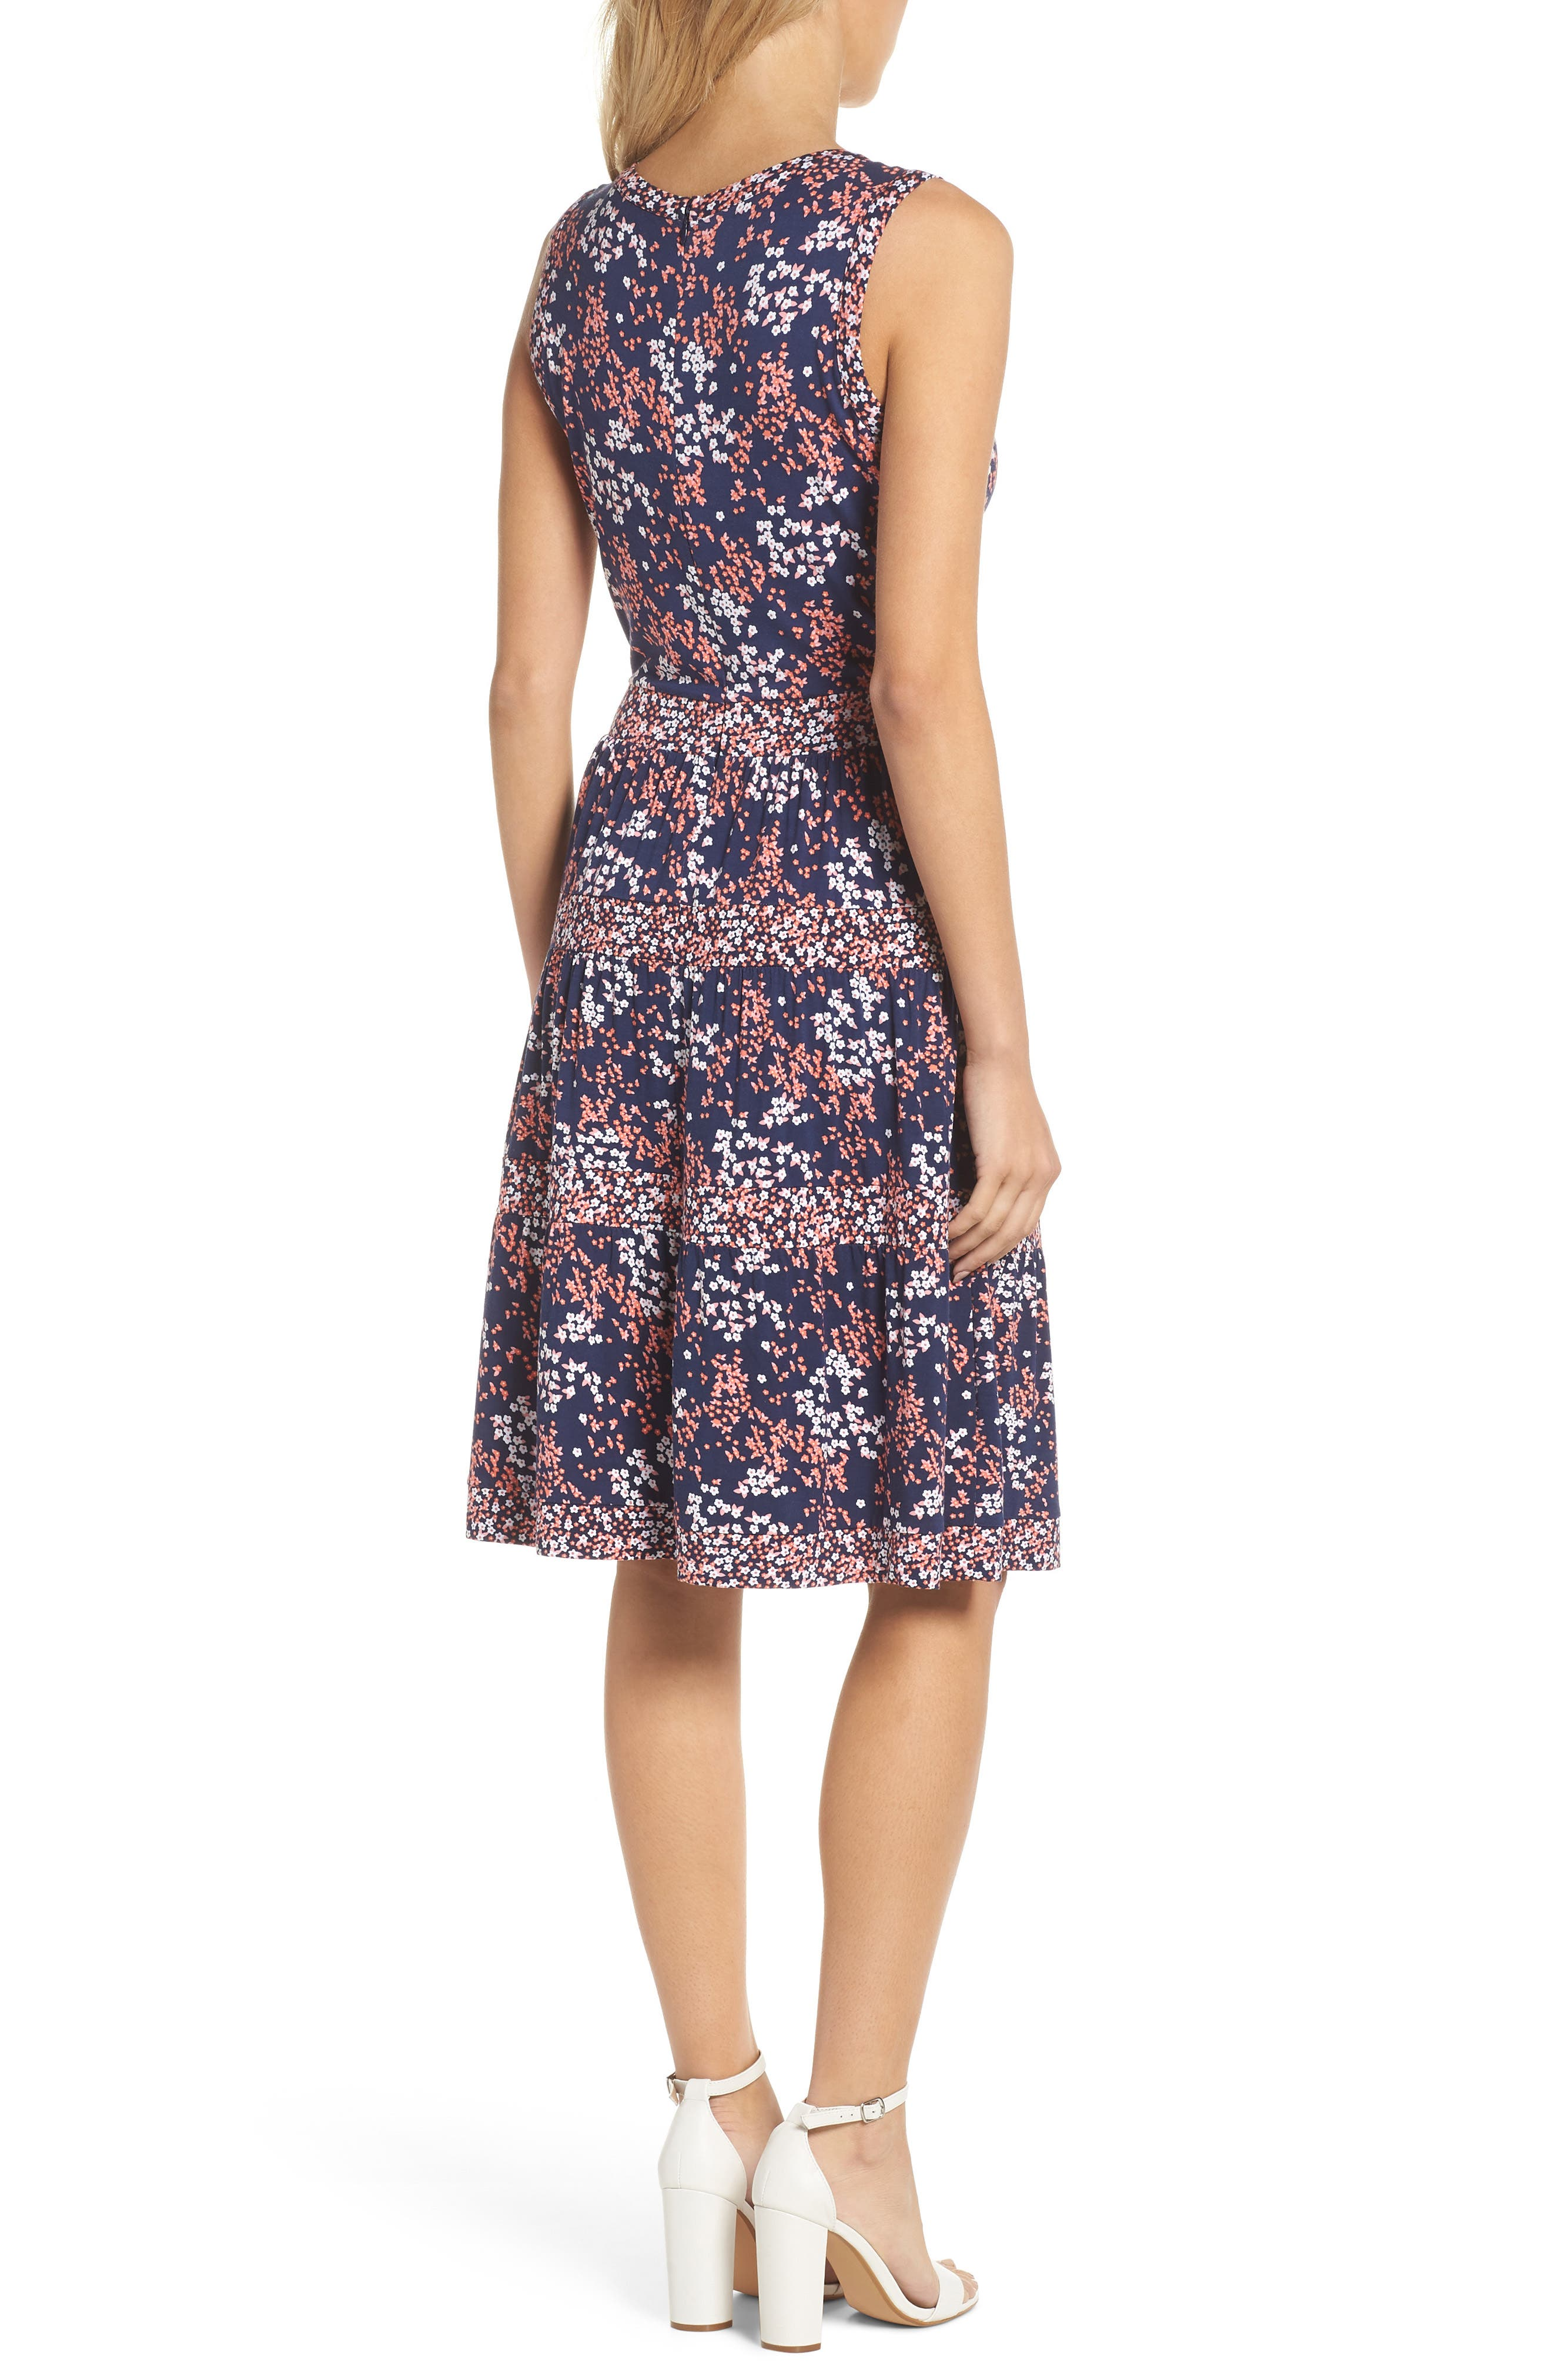 Blooms Border Tiered Dress,                             Alternate thumbnail 2, color,                             True Navy/ Bright Blush